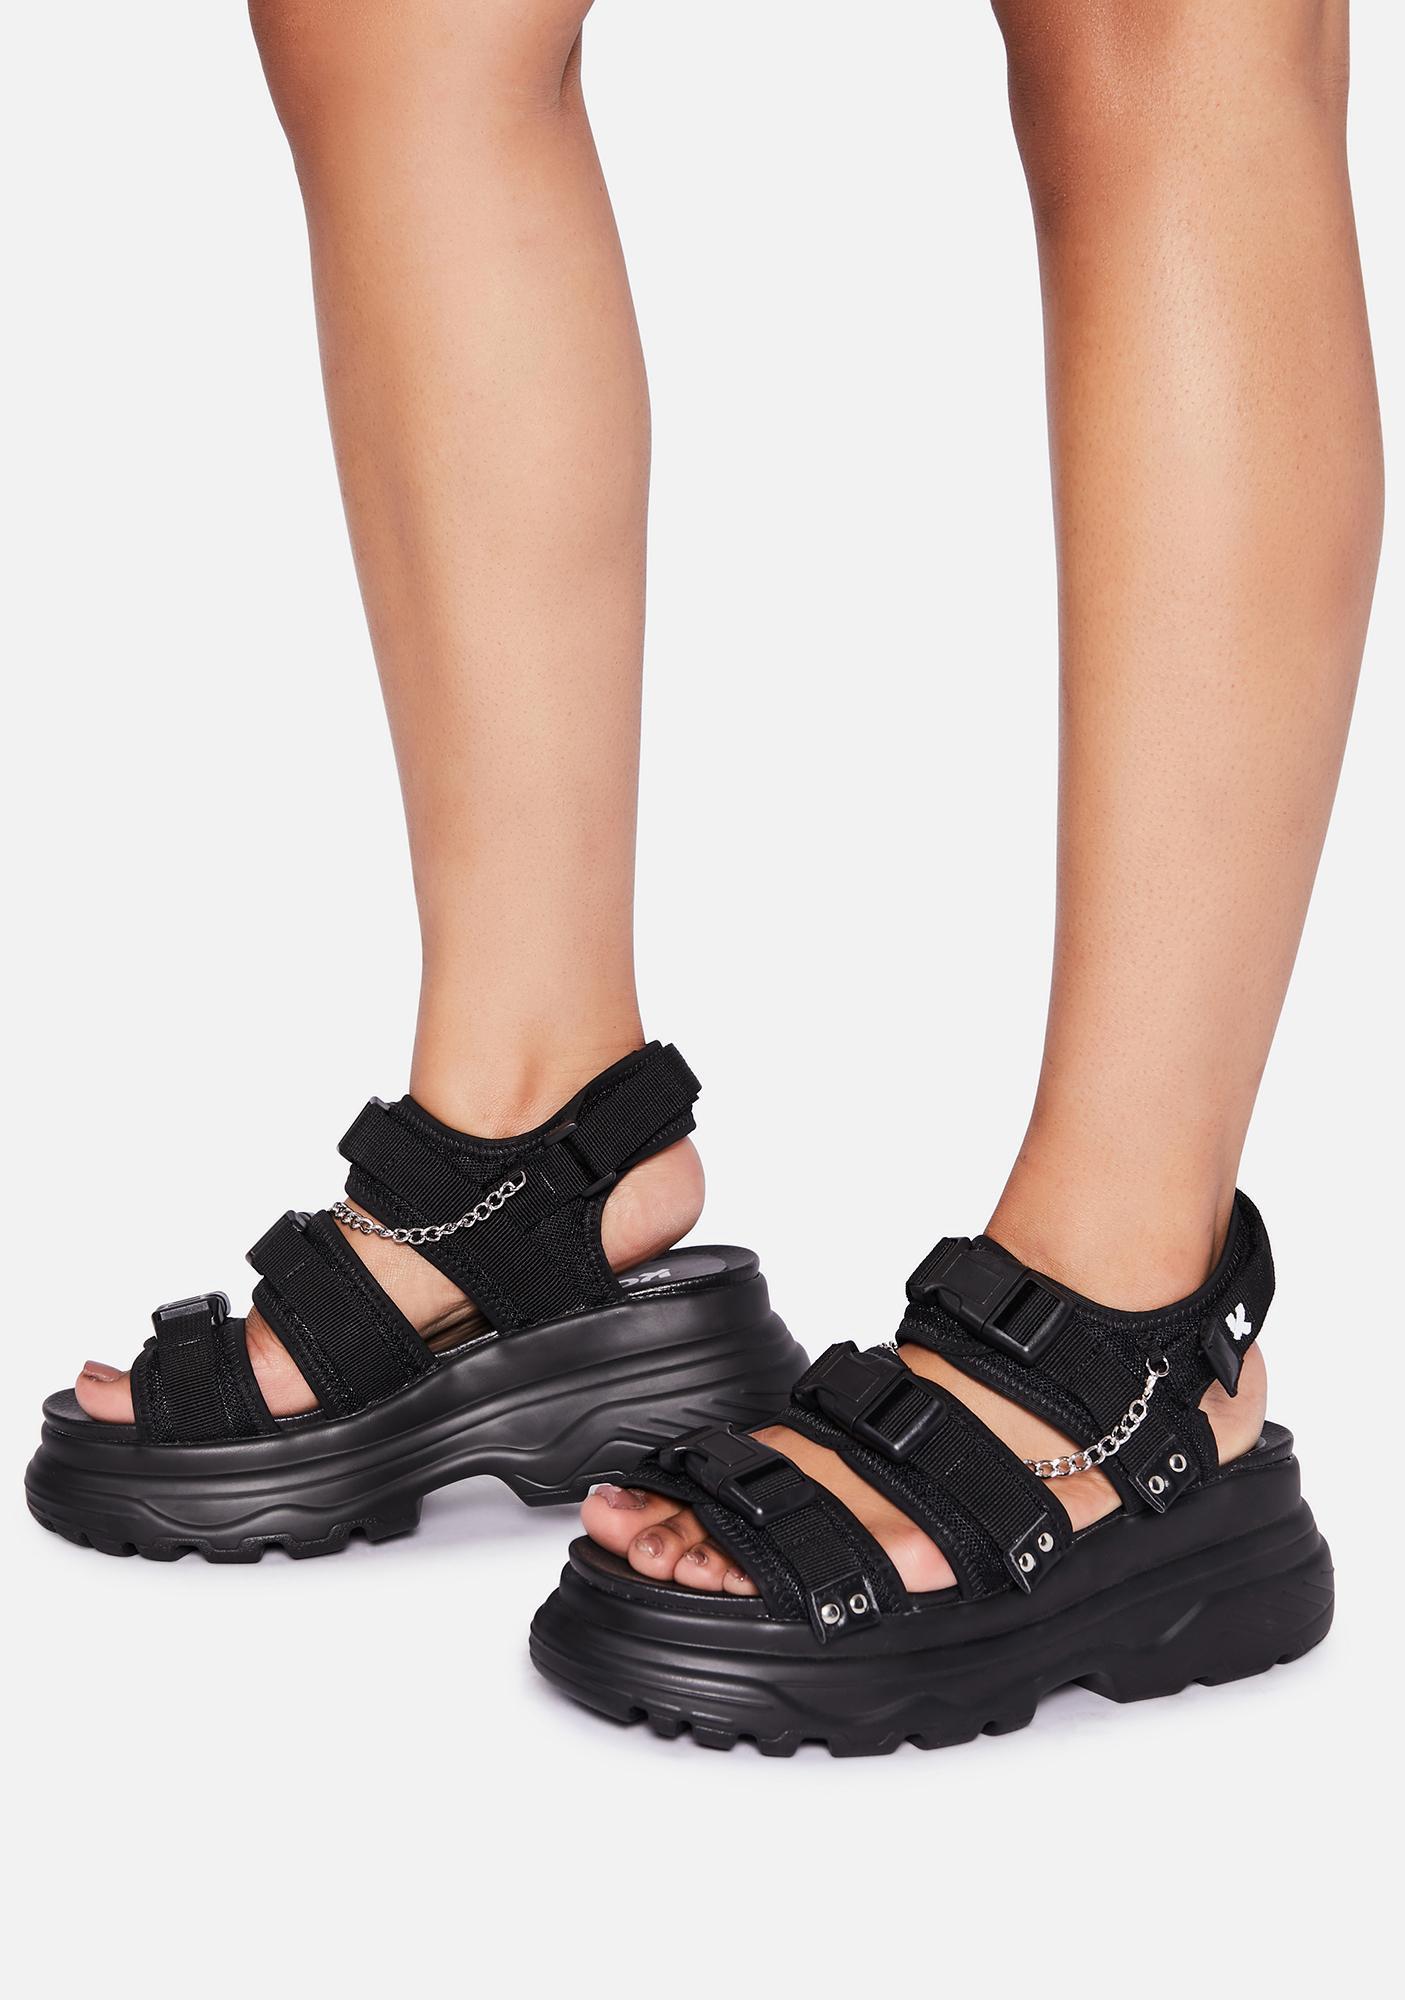 Koi Footwear Sulfur Platform Sandals